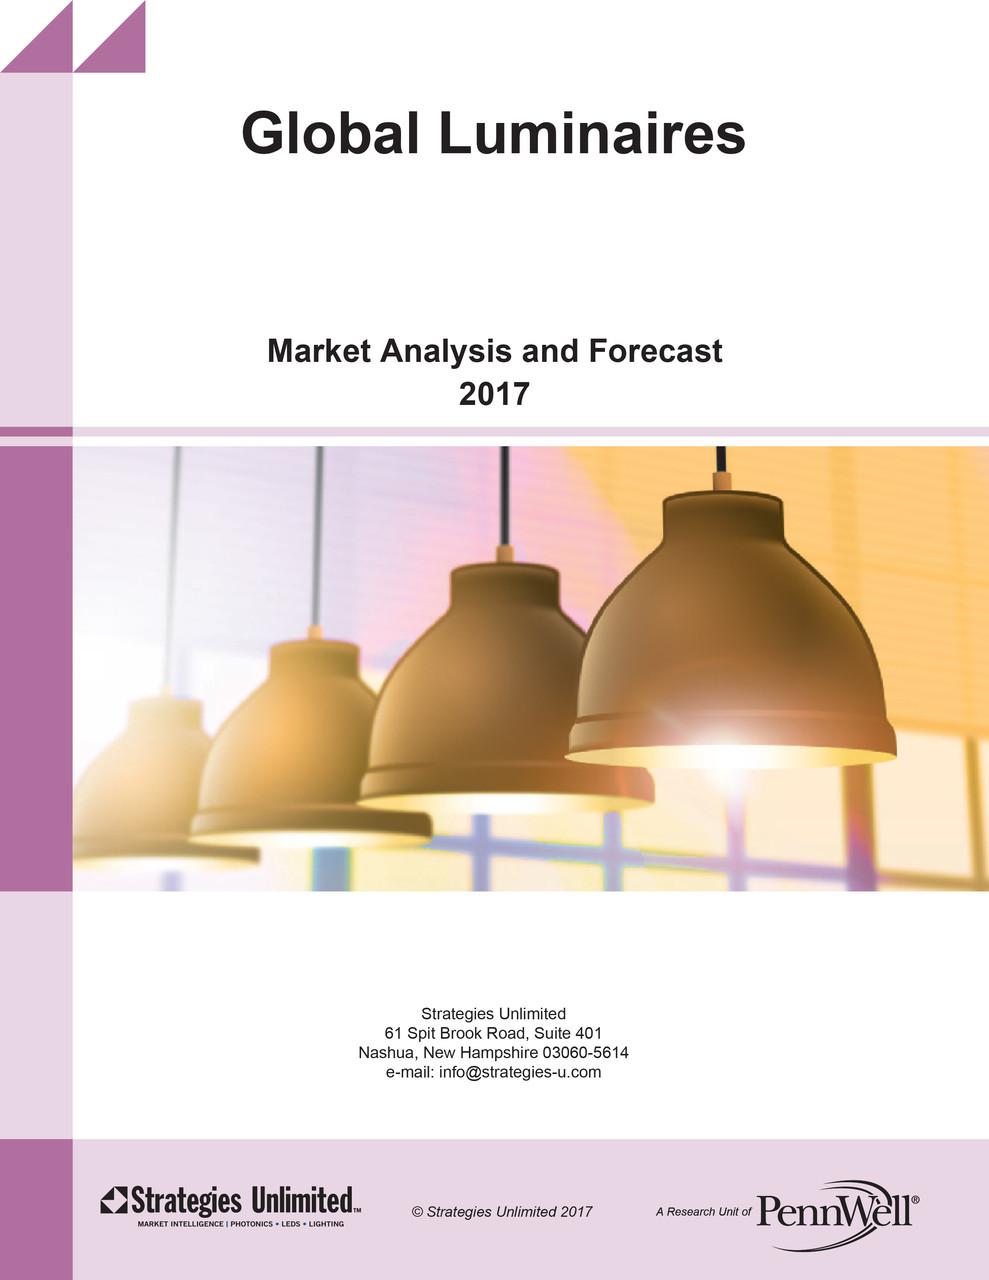 Global Luminaires Market Analysis And Forecast 2017